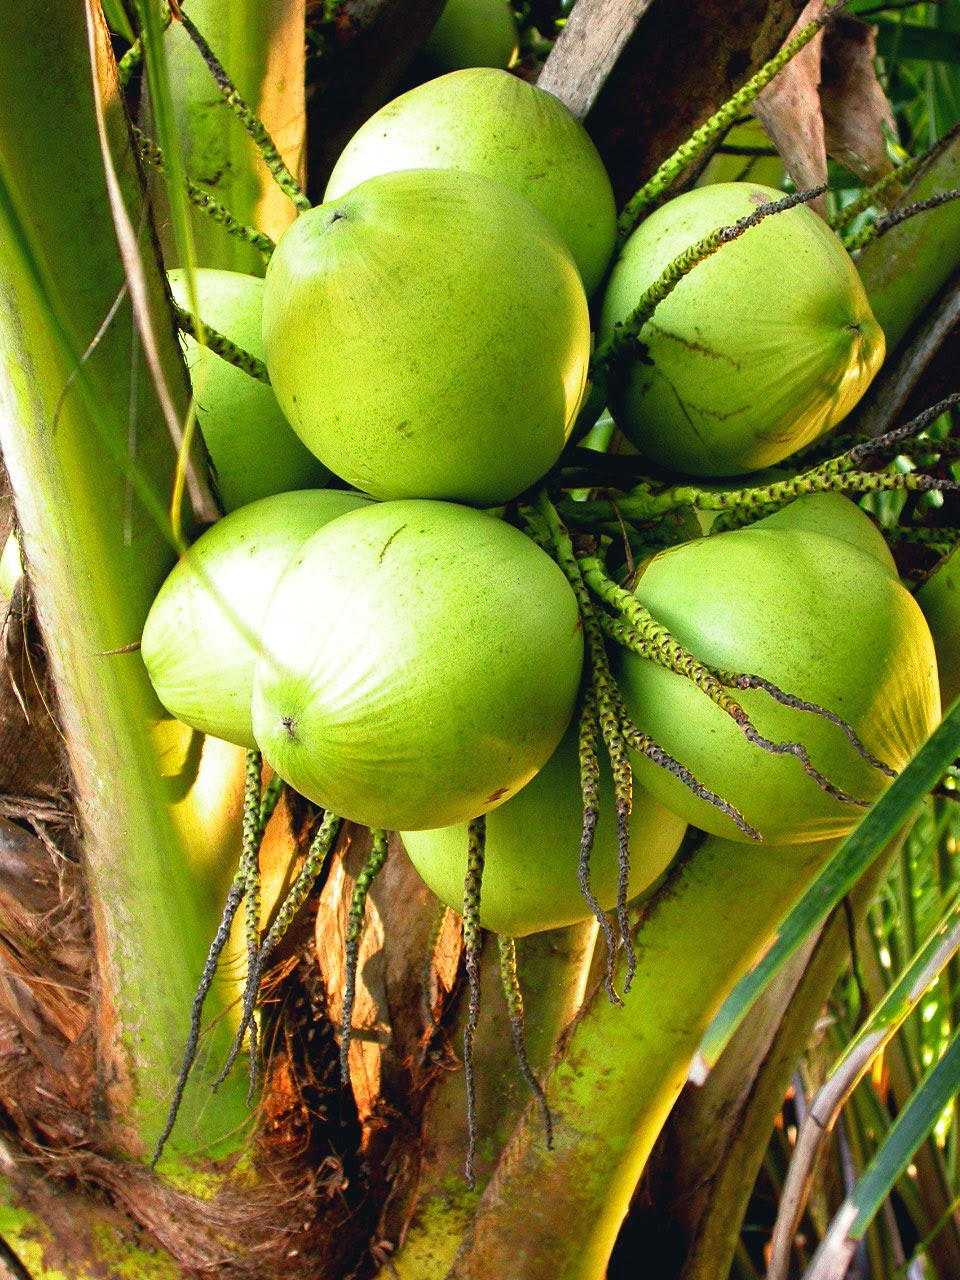 Manfaat Yang Tersimpan dari Kelapa untuk Kecantikan